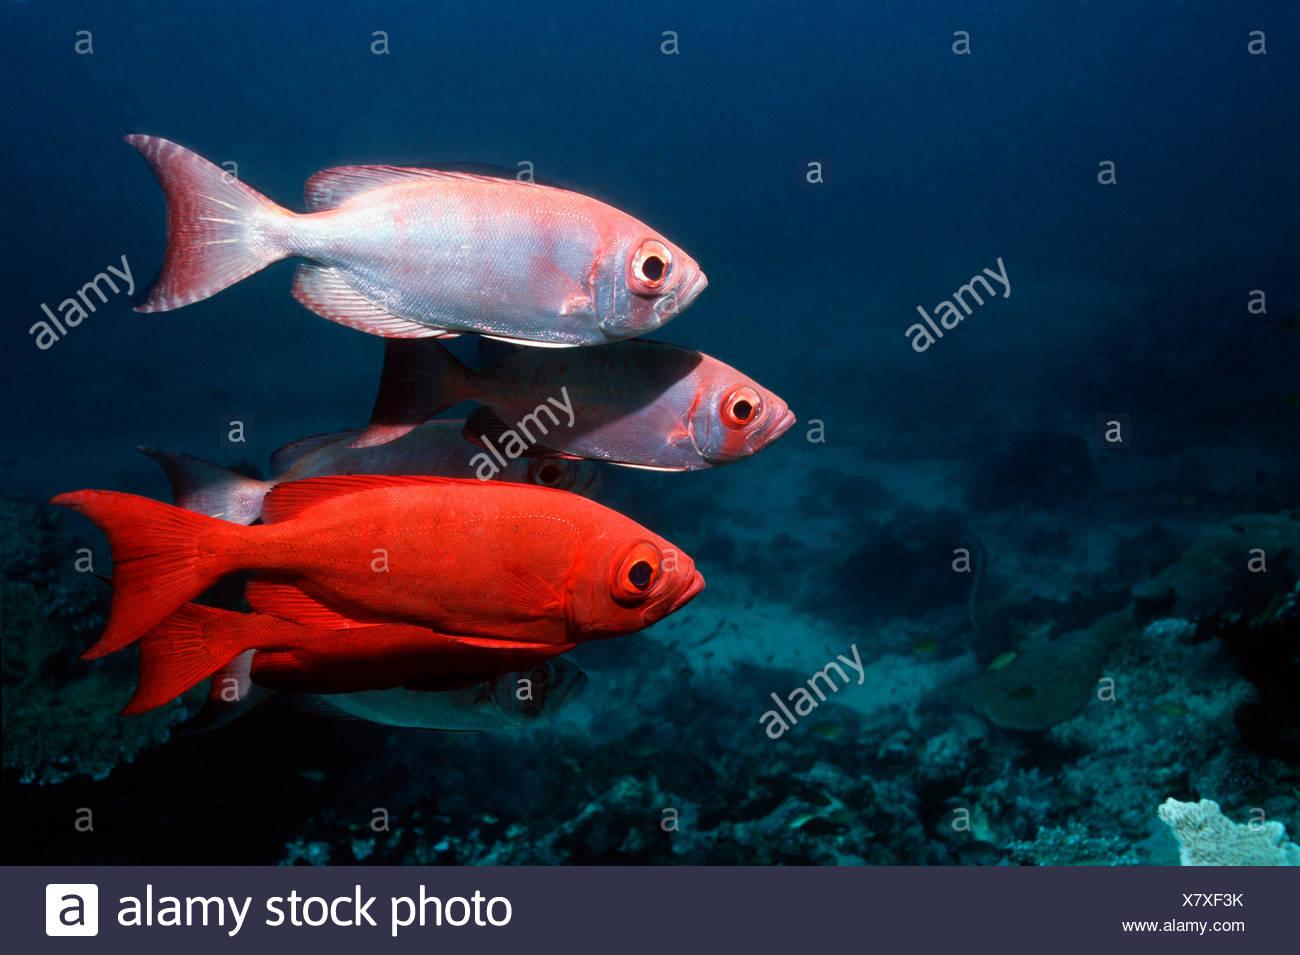 Red Bigeye Stock Photos & Red Bigeye Stock Images - Alamy